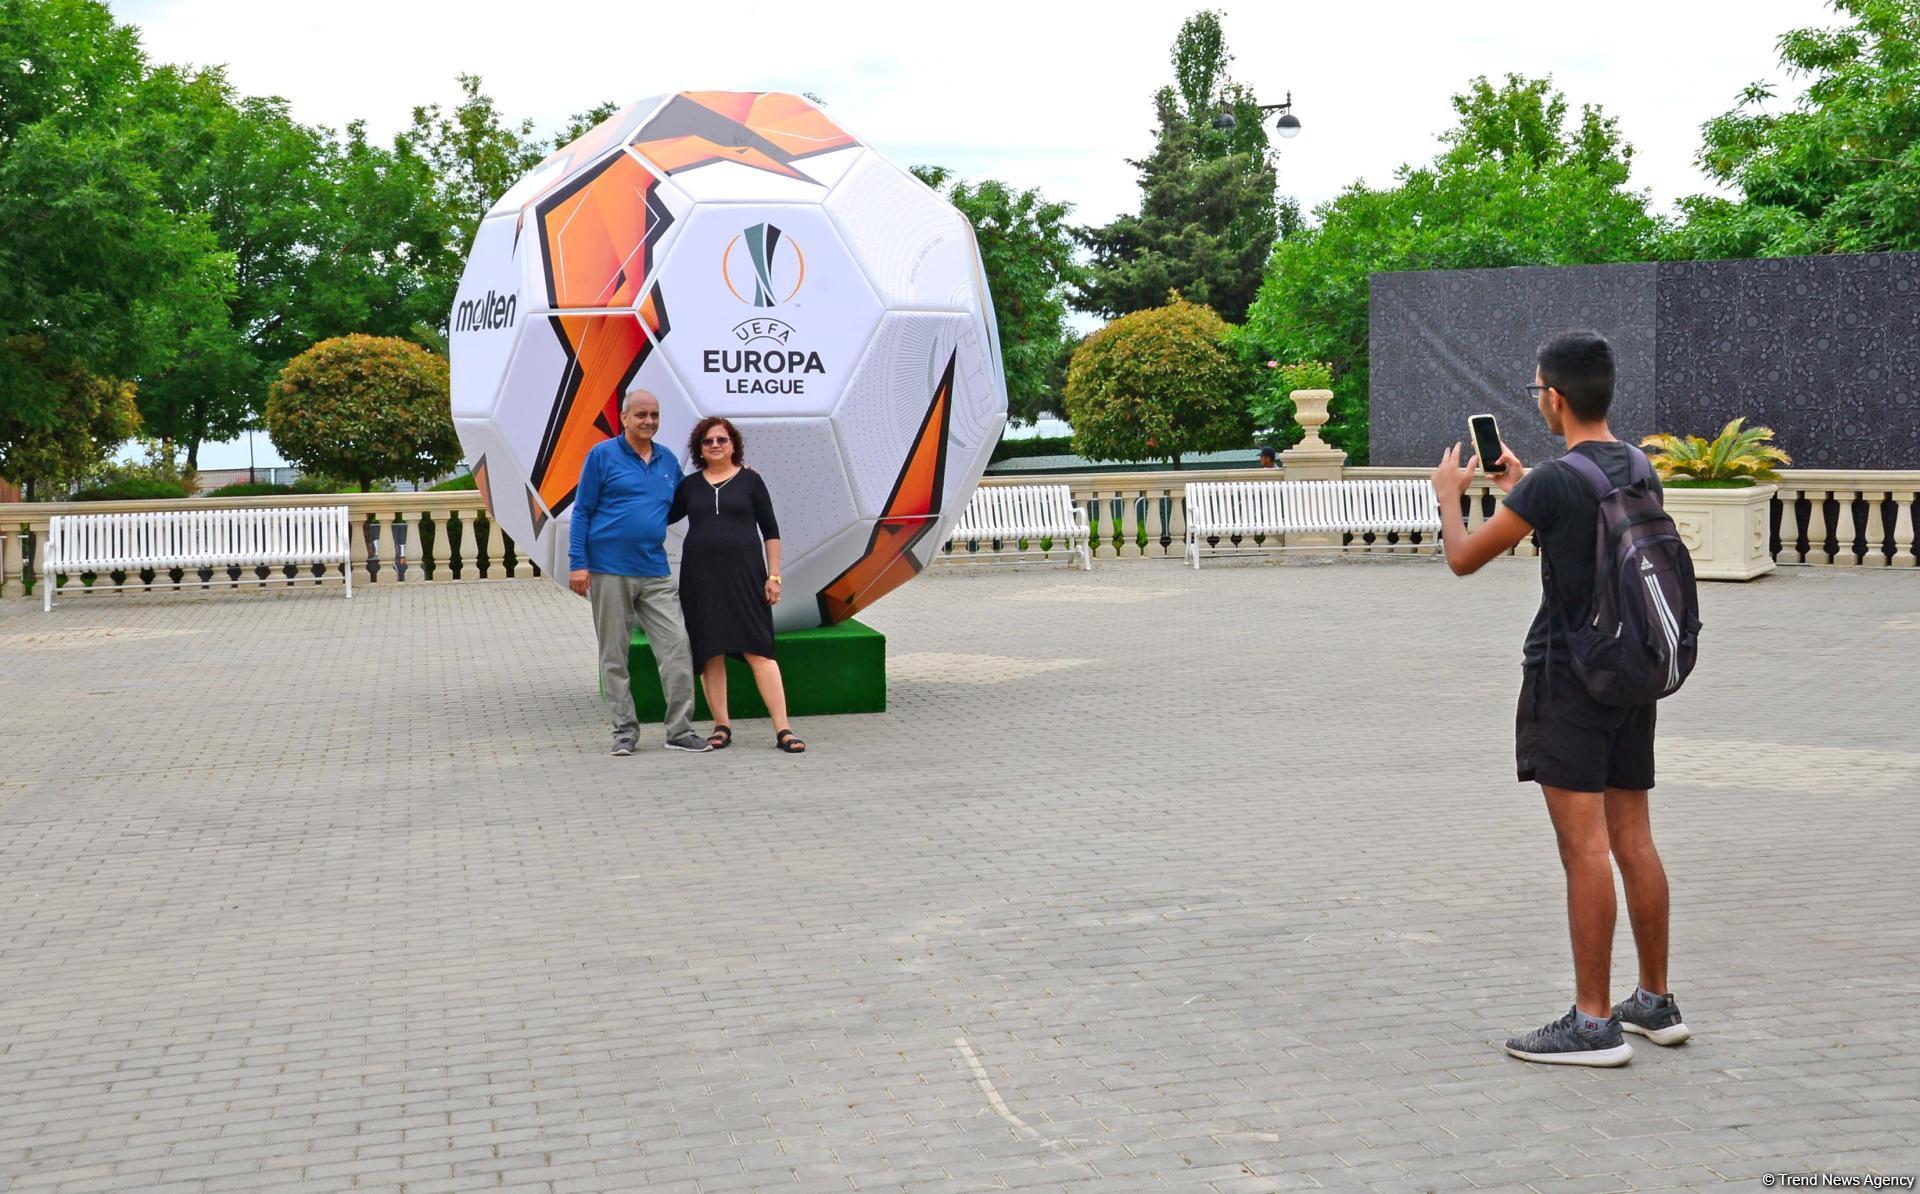 Few hours left before start of UEFA Europa League final match in Baku (PHOTO)